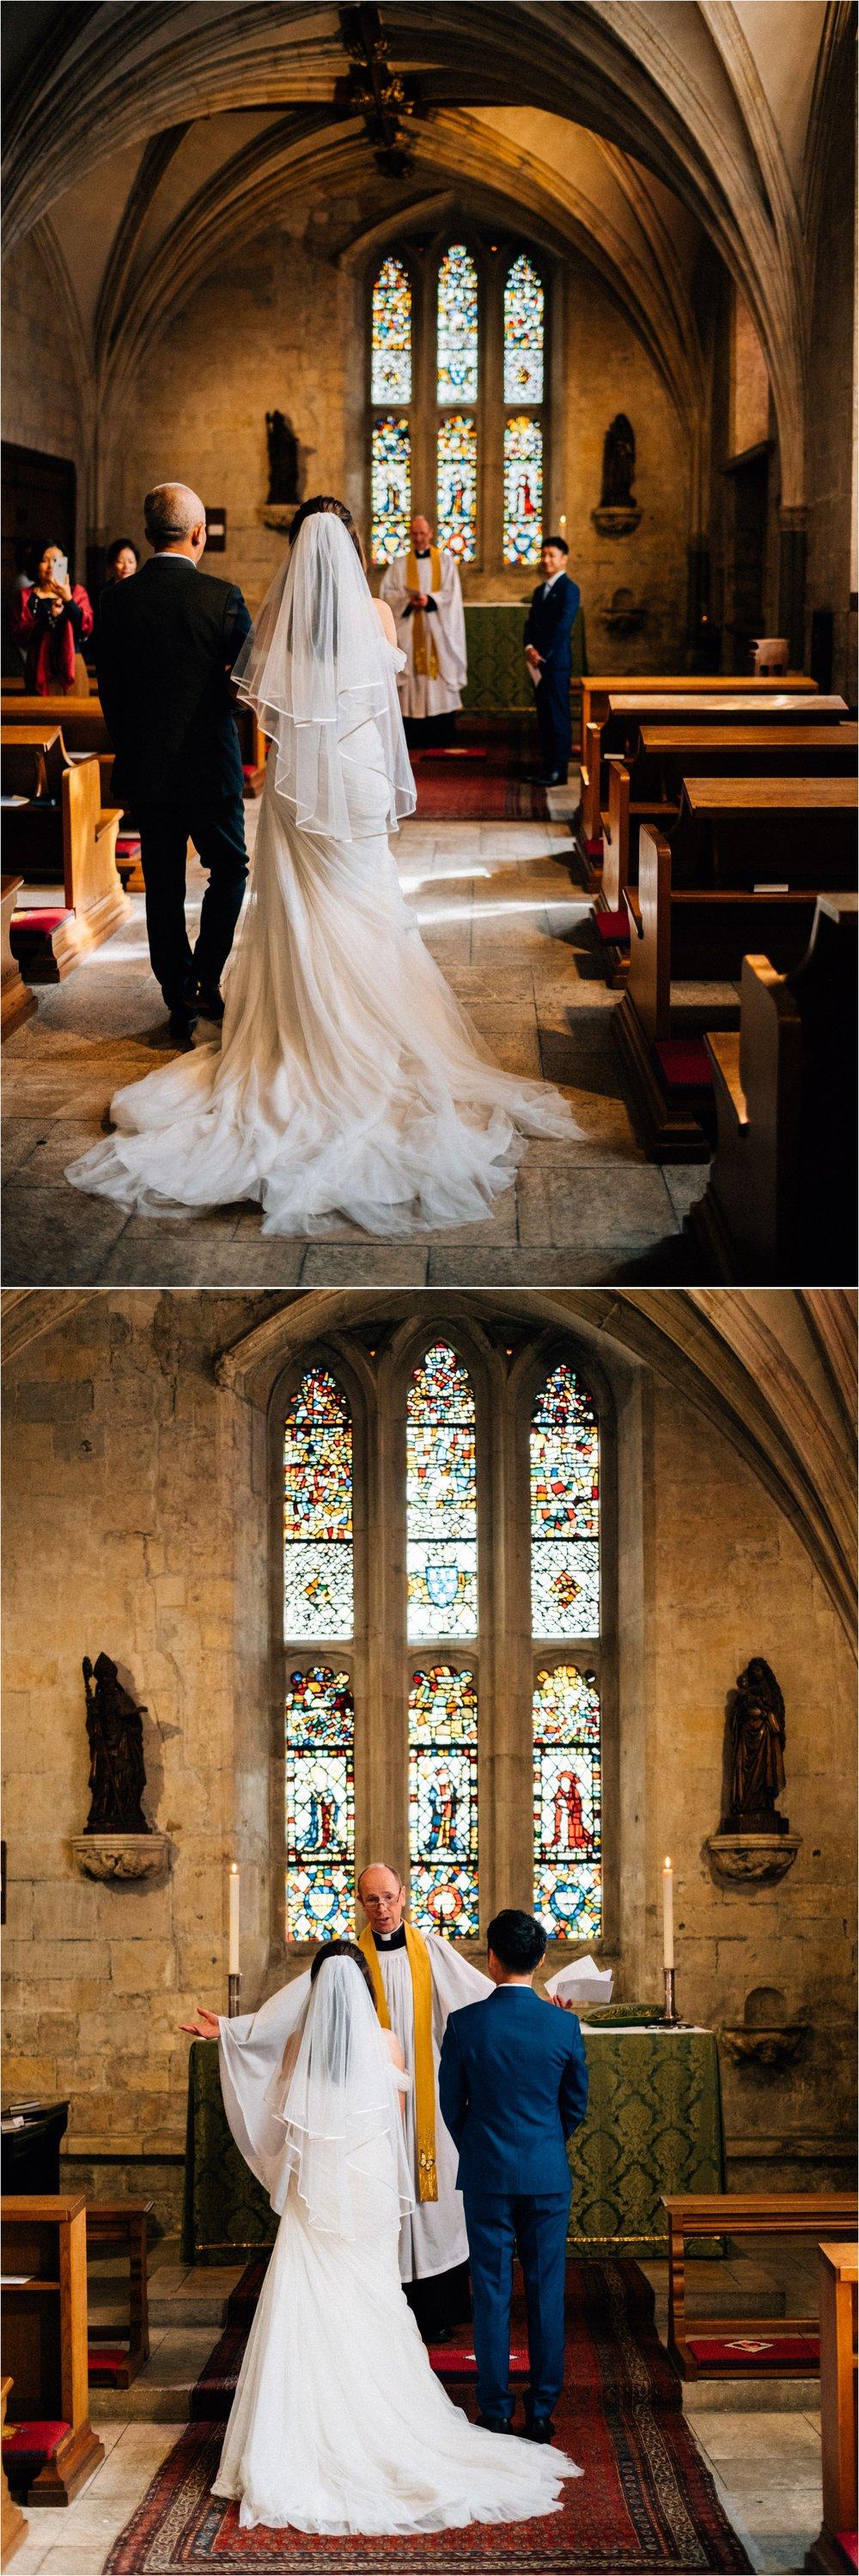 York city elopement wedding photographer_0128.jpg